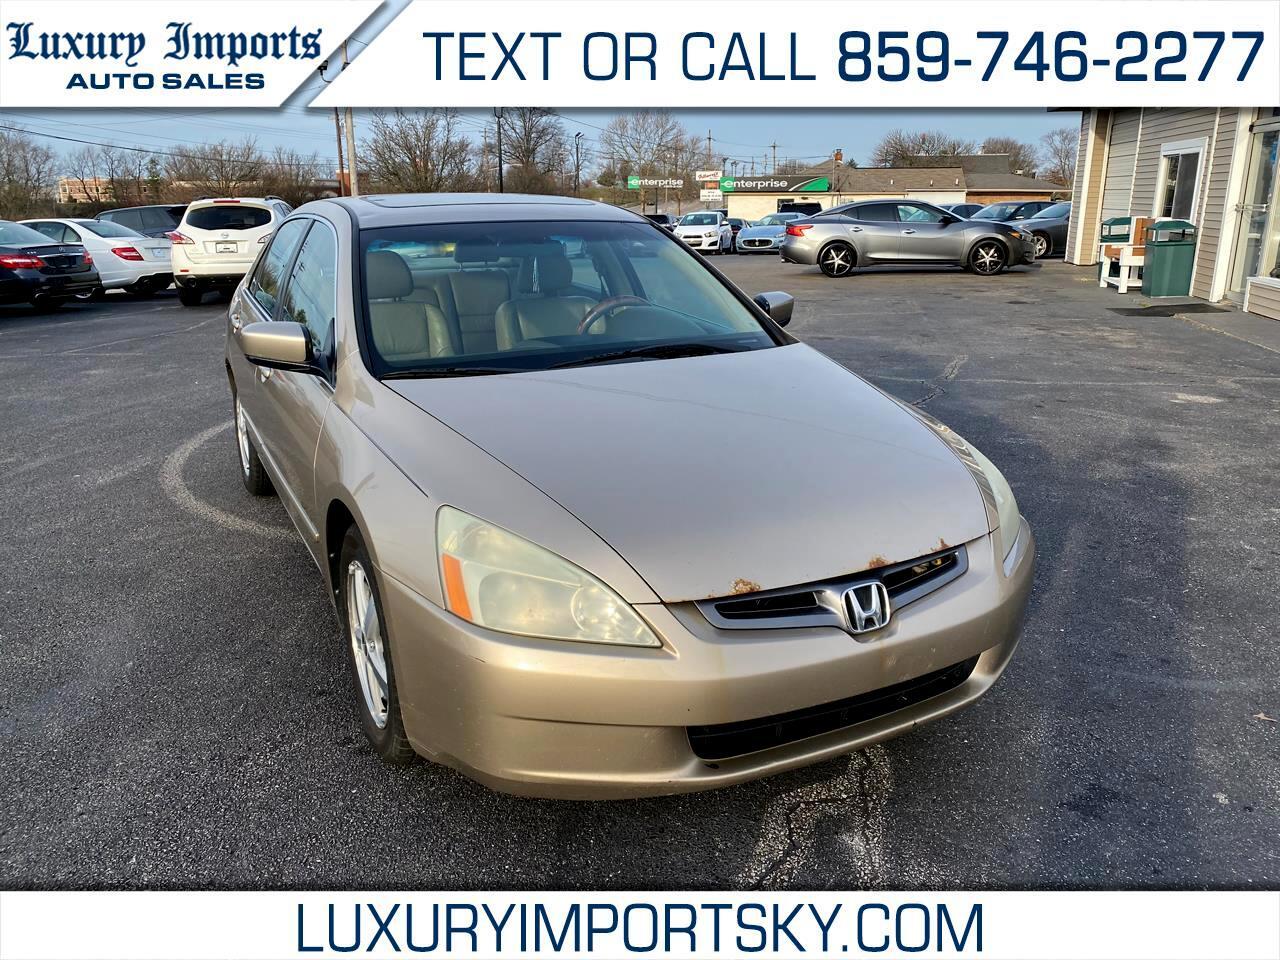 Honda Accord EX sedan 2004